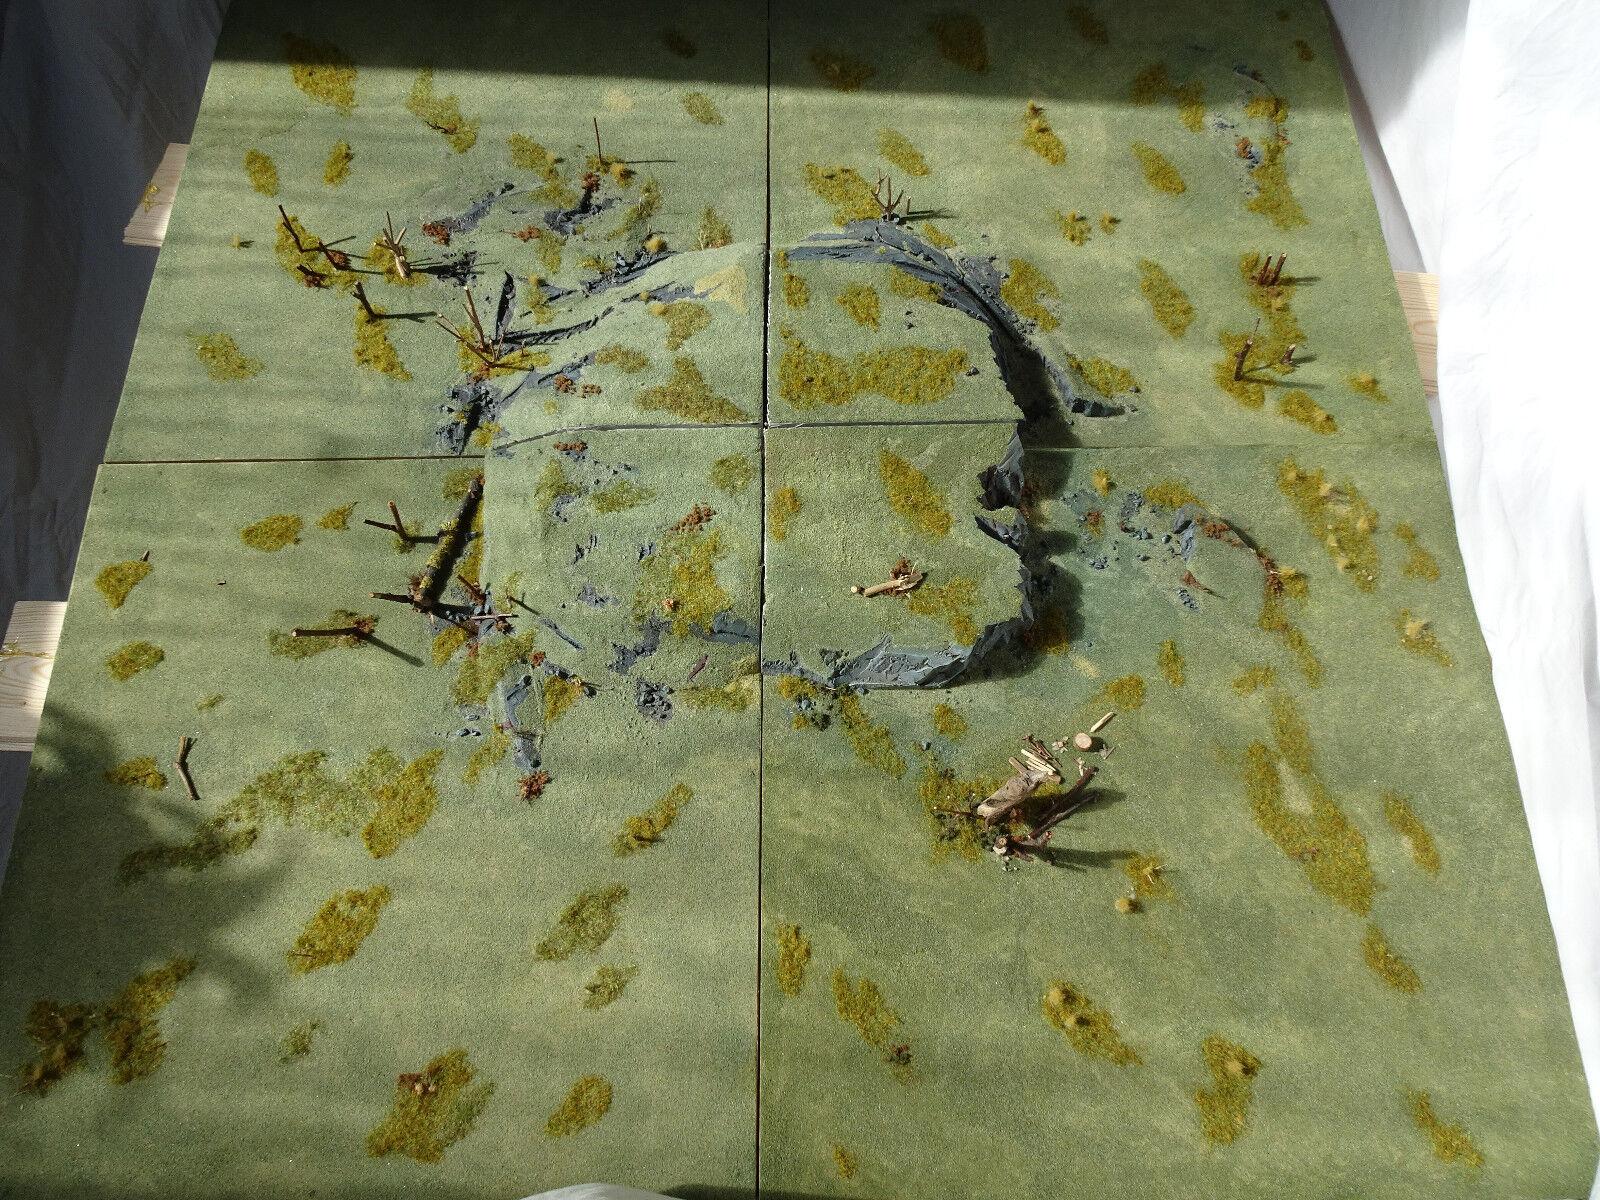 Autumn Pastures Modular Terrain 4 Tiles -Wargame Gaming Board Hills